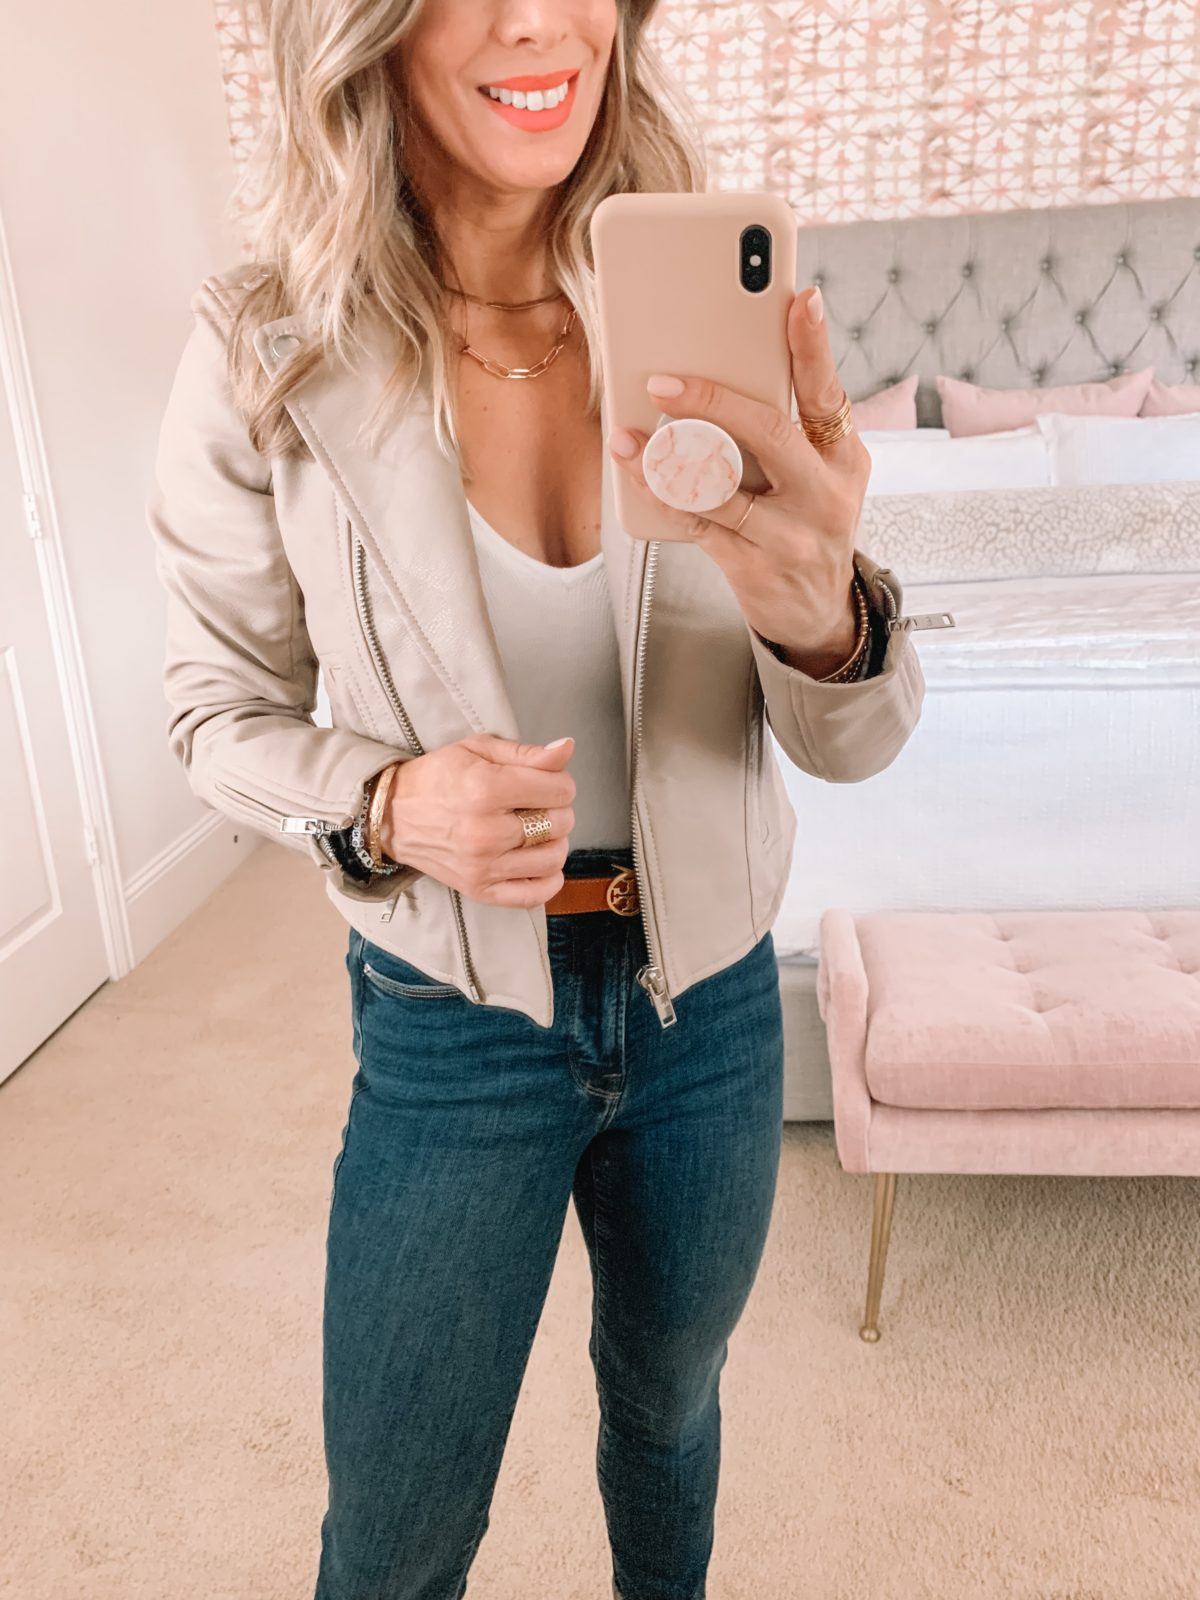 Dressing Room Finds, Abercrombie, Nordstrom, Bodysuit, Jacket, Jeans, Wedges, Crossbody